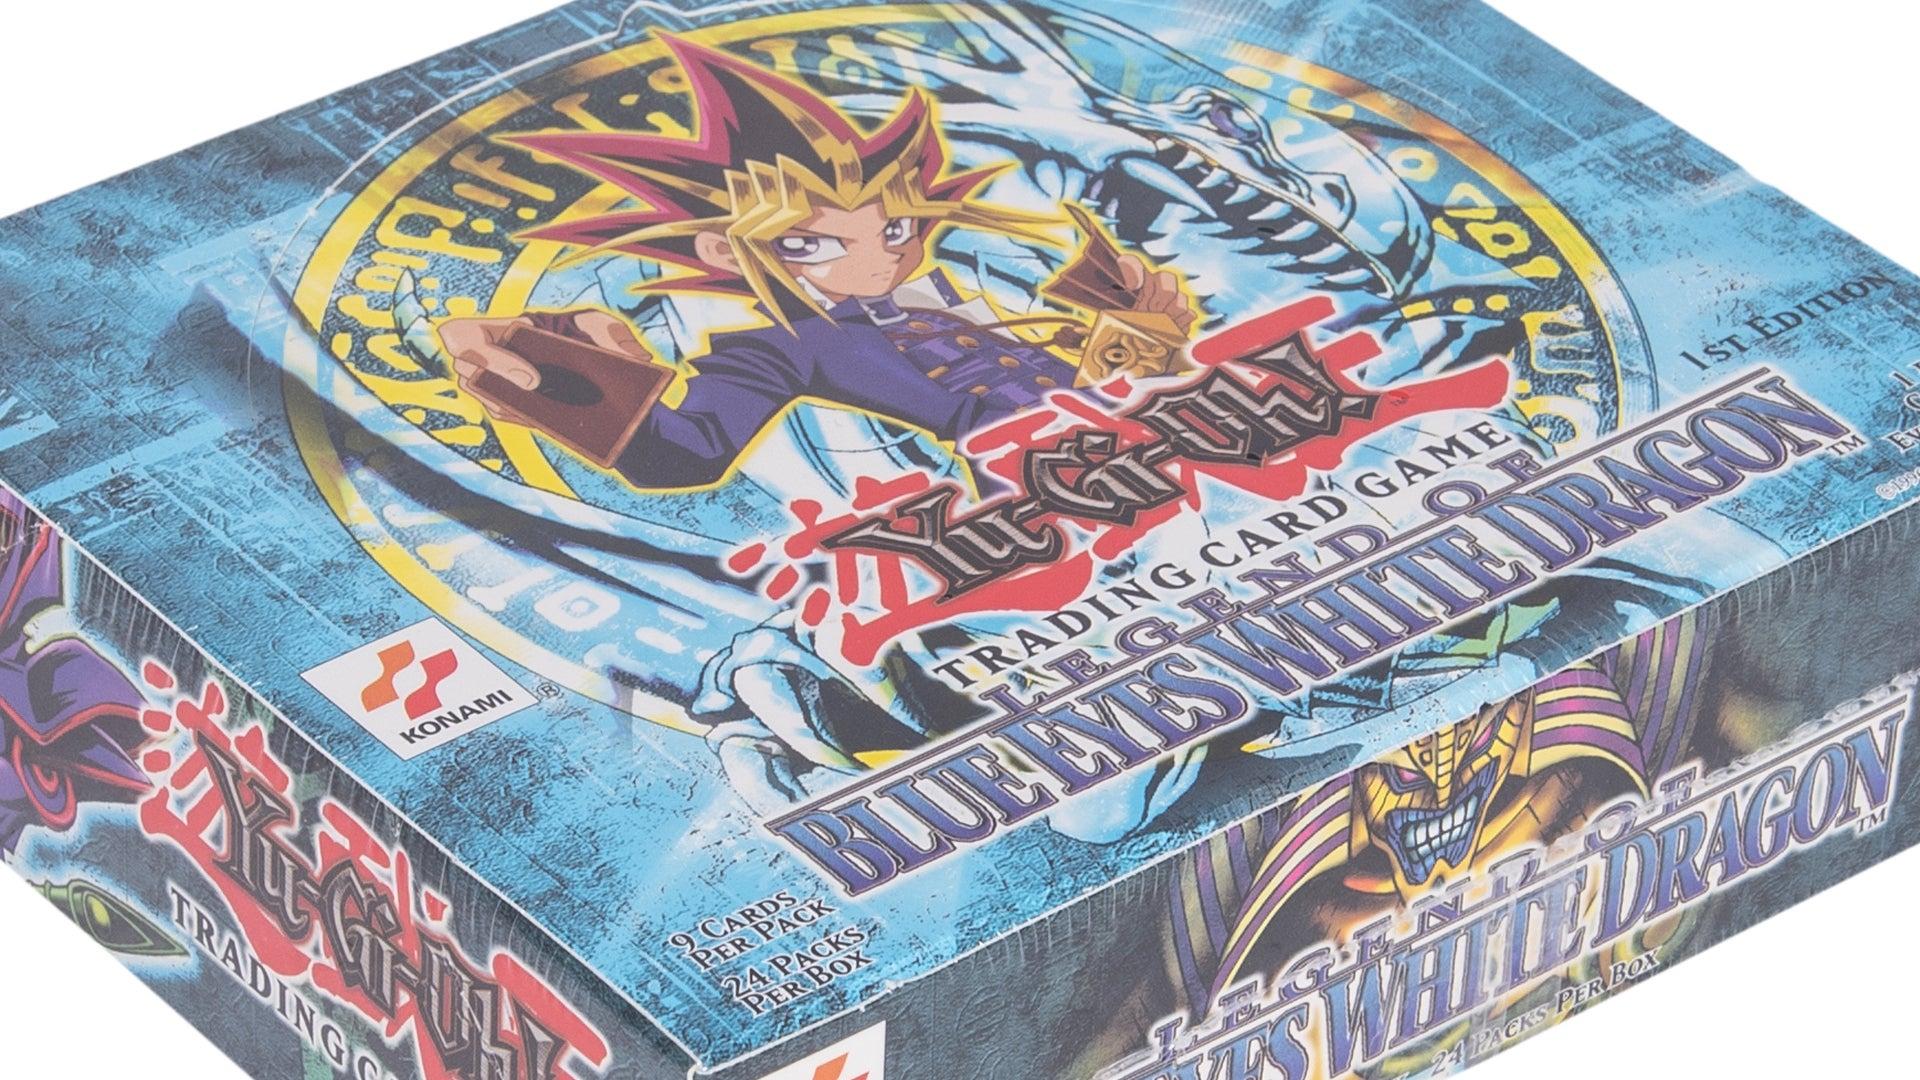 Yu-Gi-Oh! Trading Card Game Legend of Blue Eyes White Dragon booster box